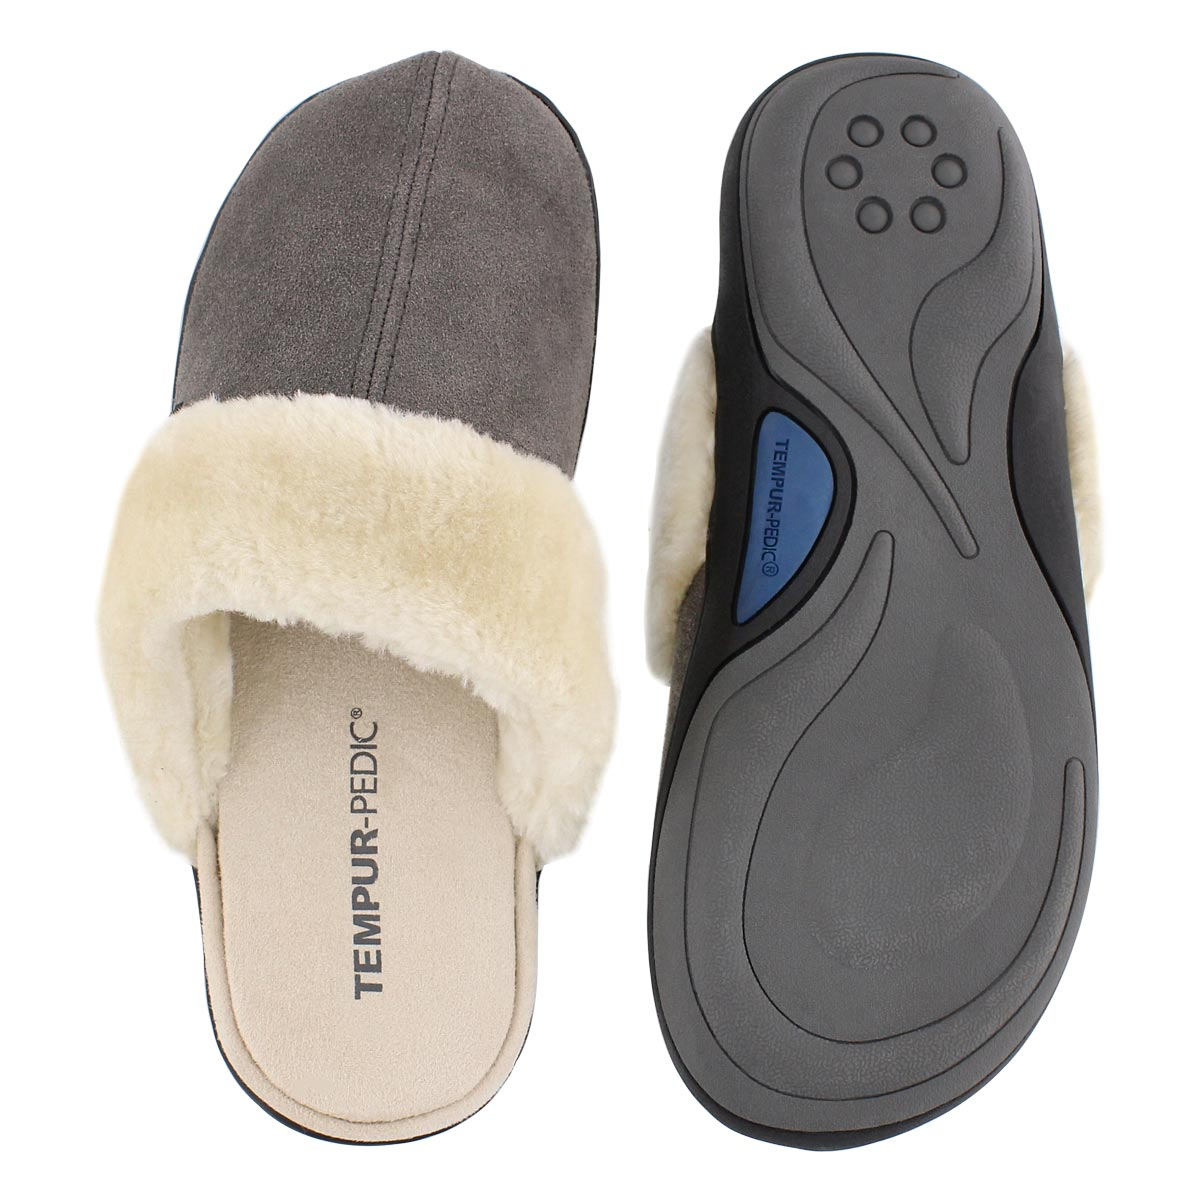 Lds Kensley shale open back slipper